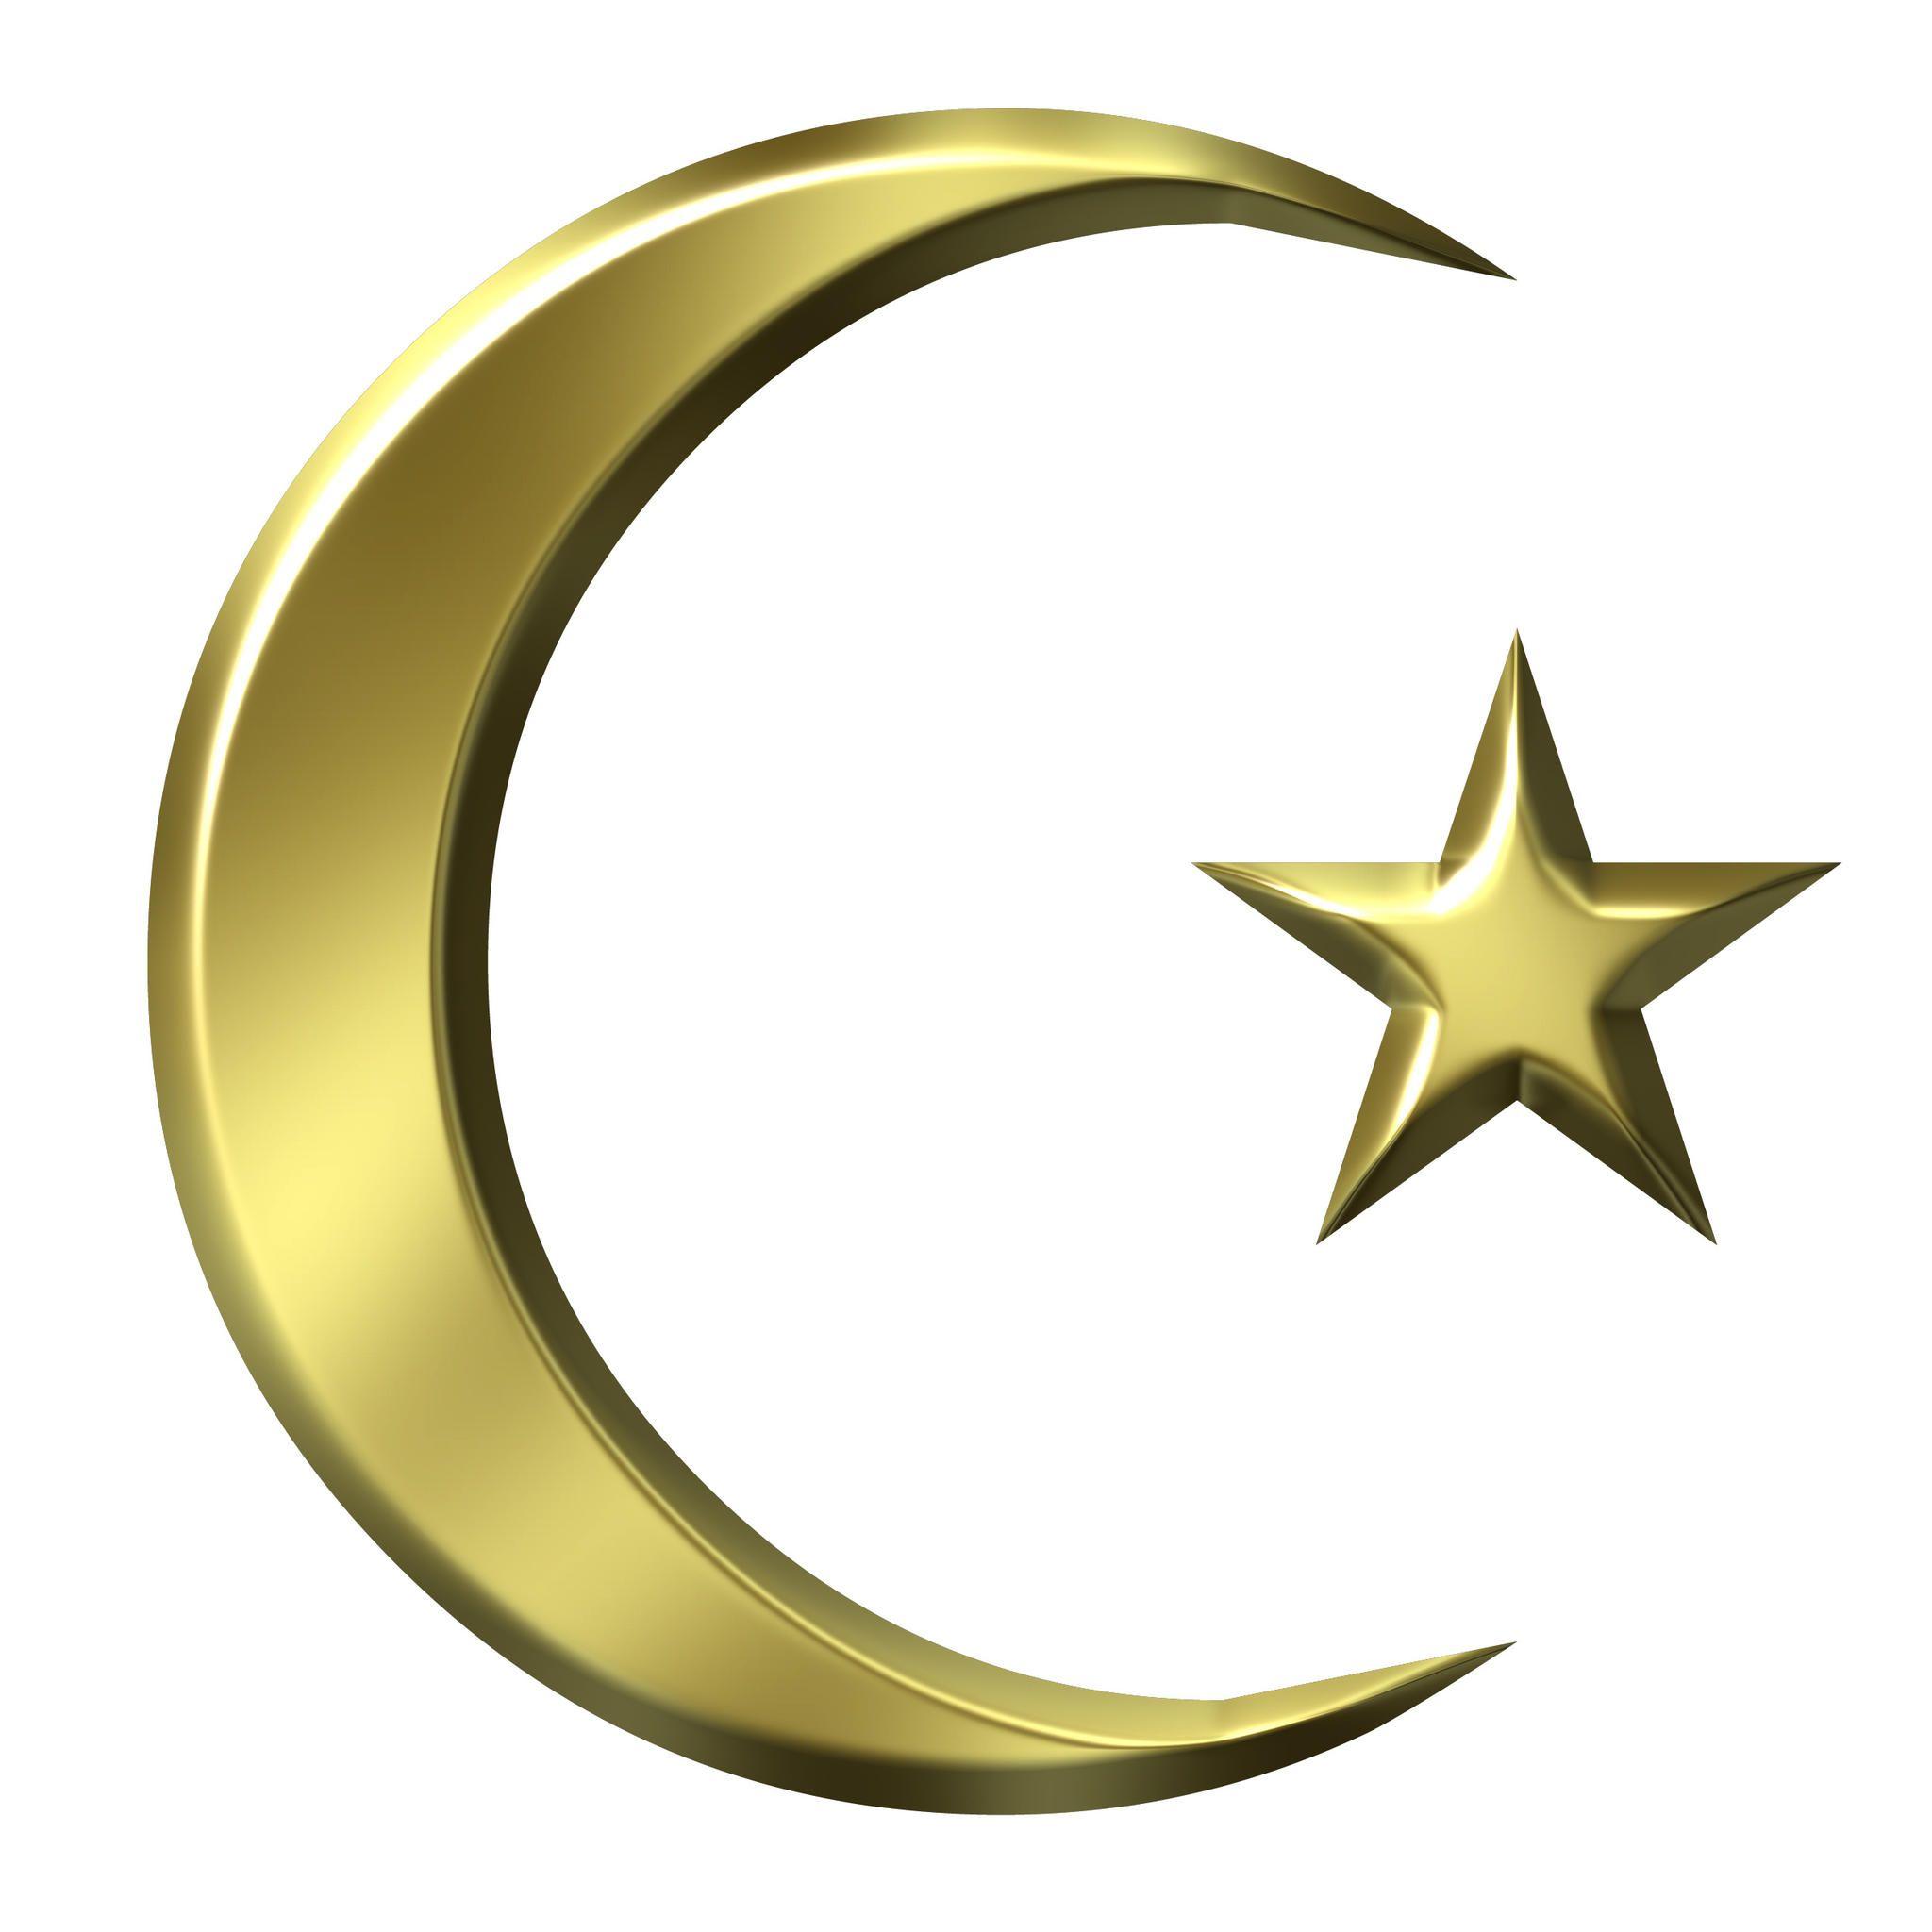 3D Golden Islamic Symbol | Islam, Islamic and Muslim